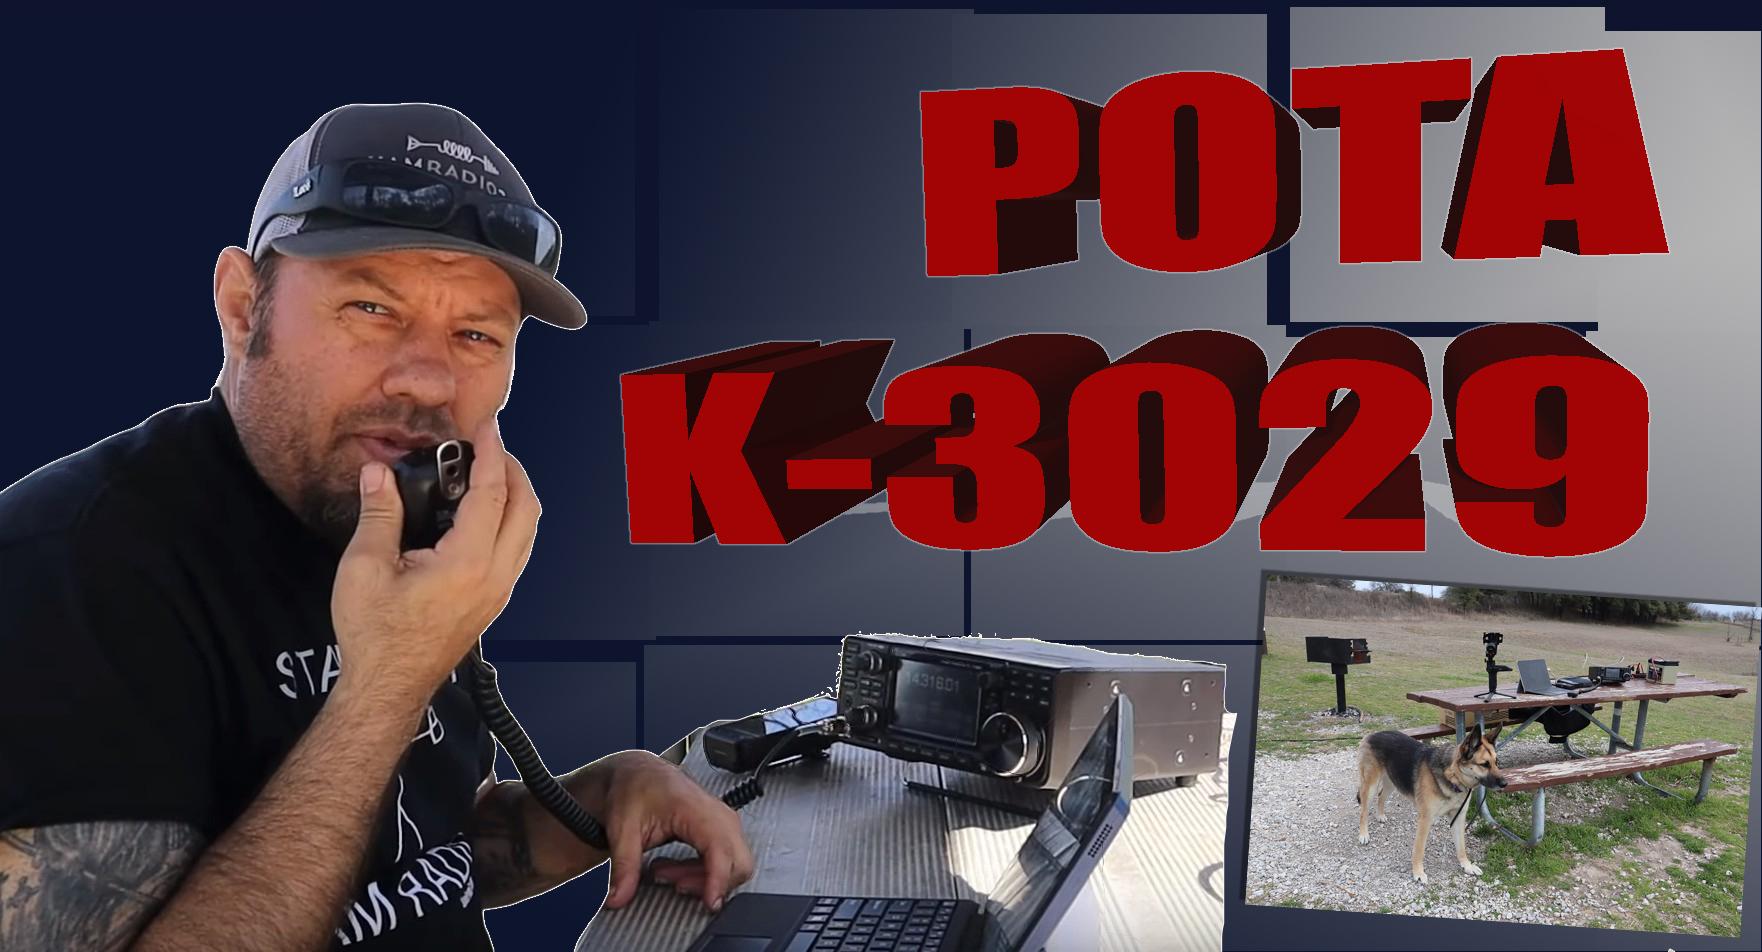 Episode 352: Ham Radio Parks On The Air Activation | POTA K-3029